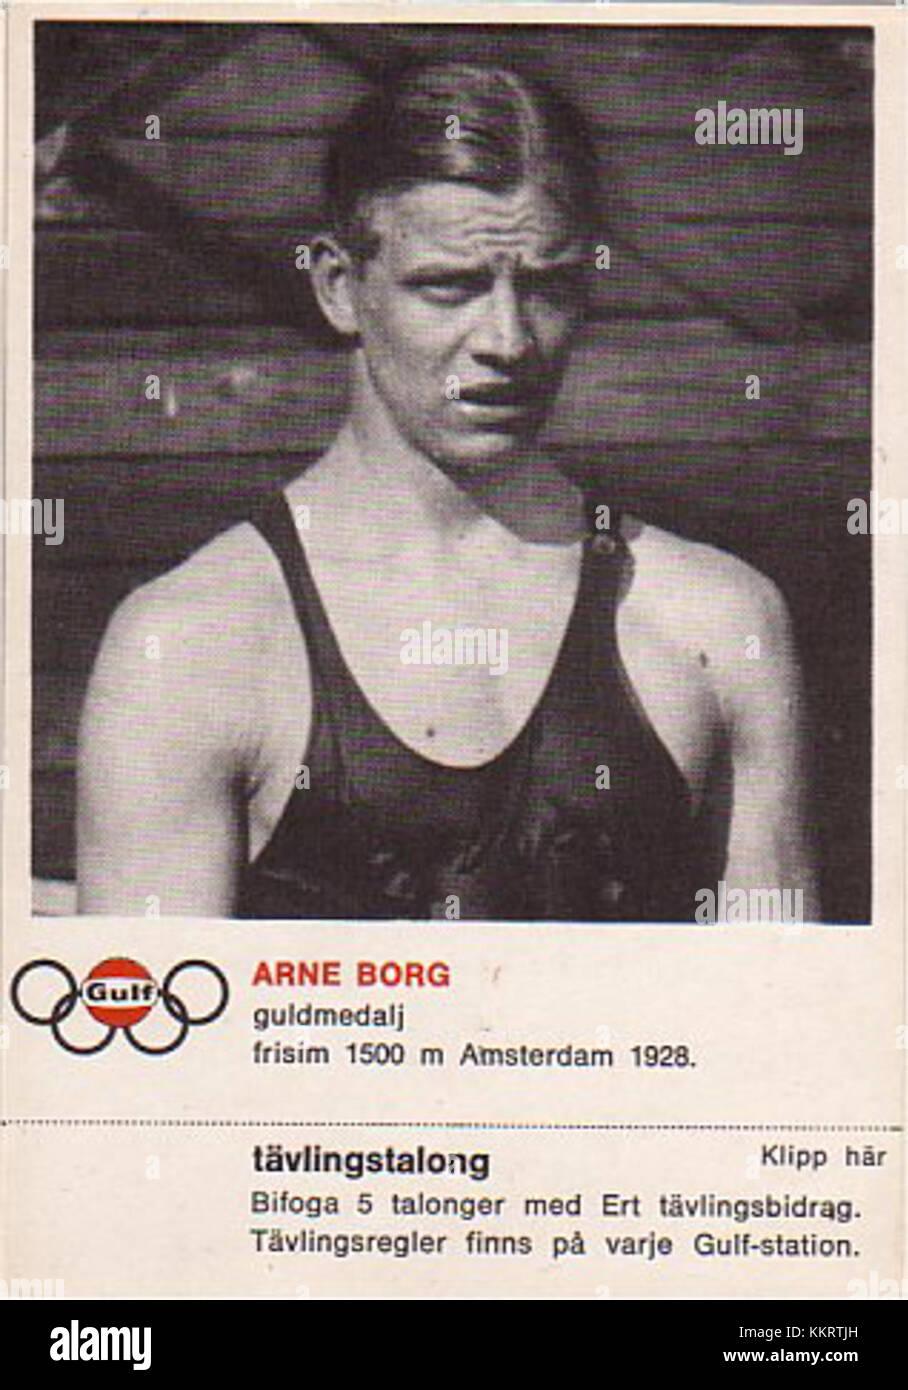 Arne Borg